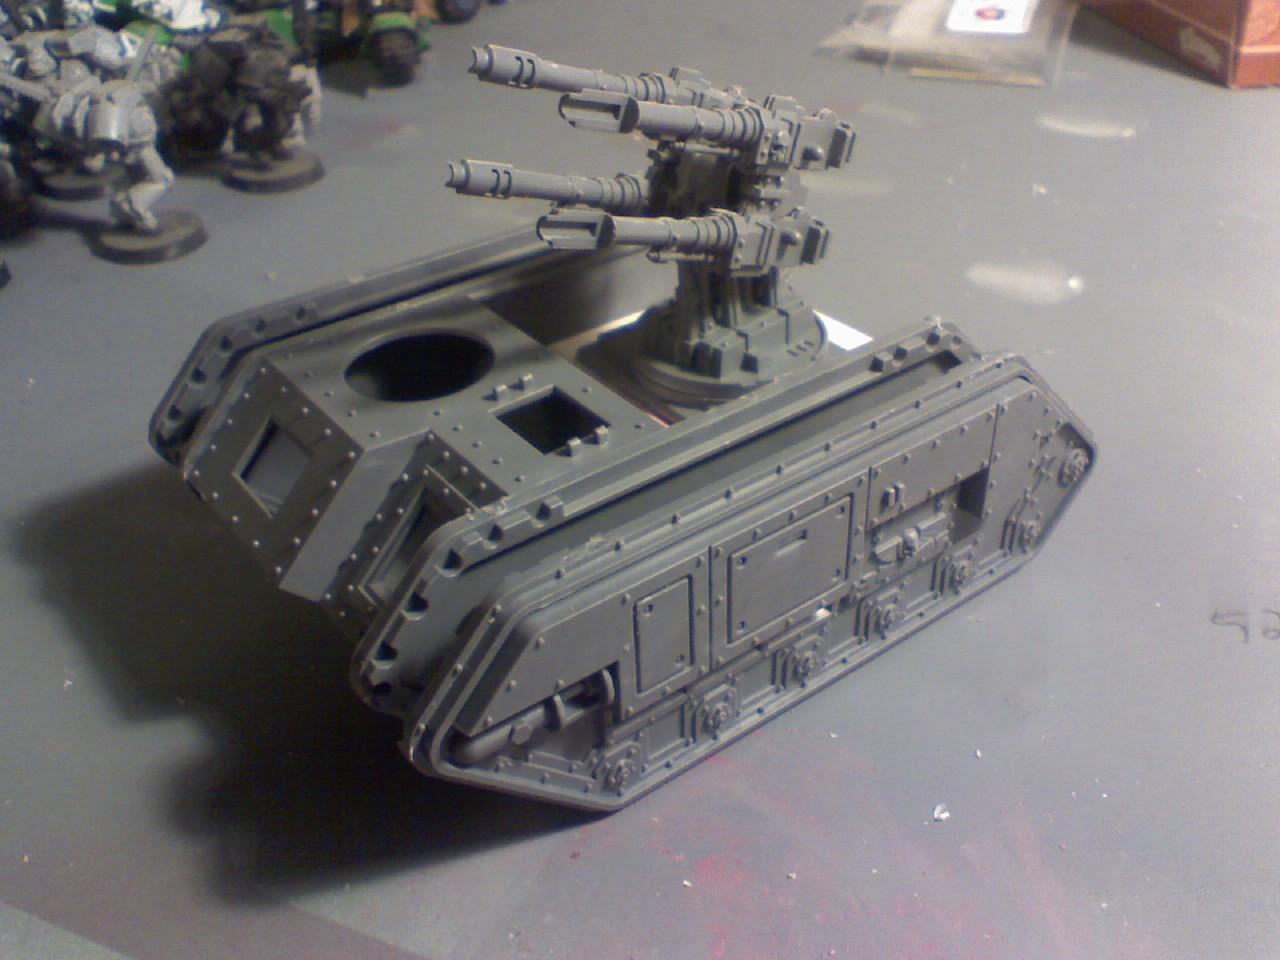 Chimera, Conversion, Hydra, Imperial Guard, Warhammer 40,000, Work In Progress